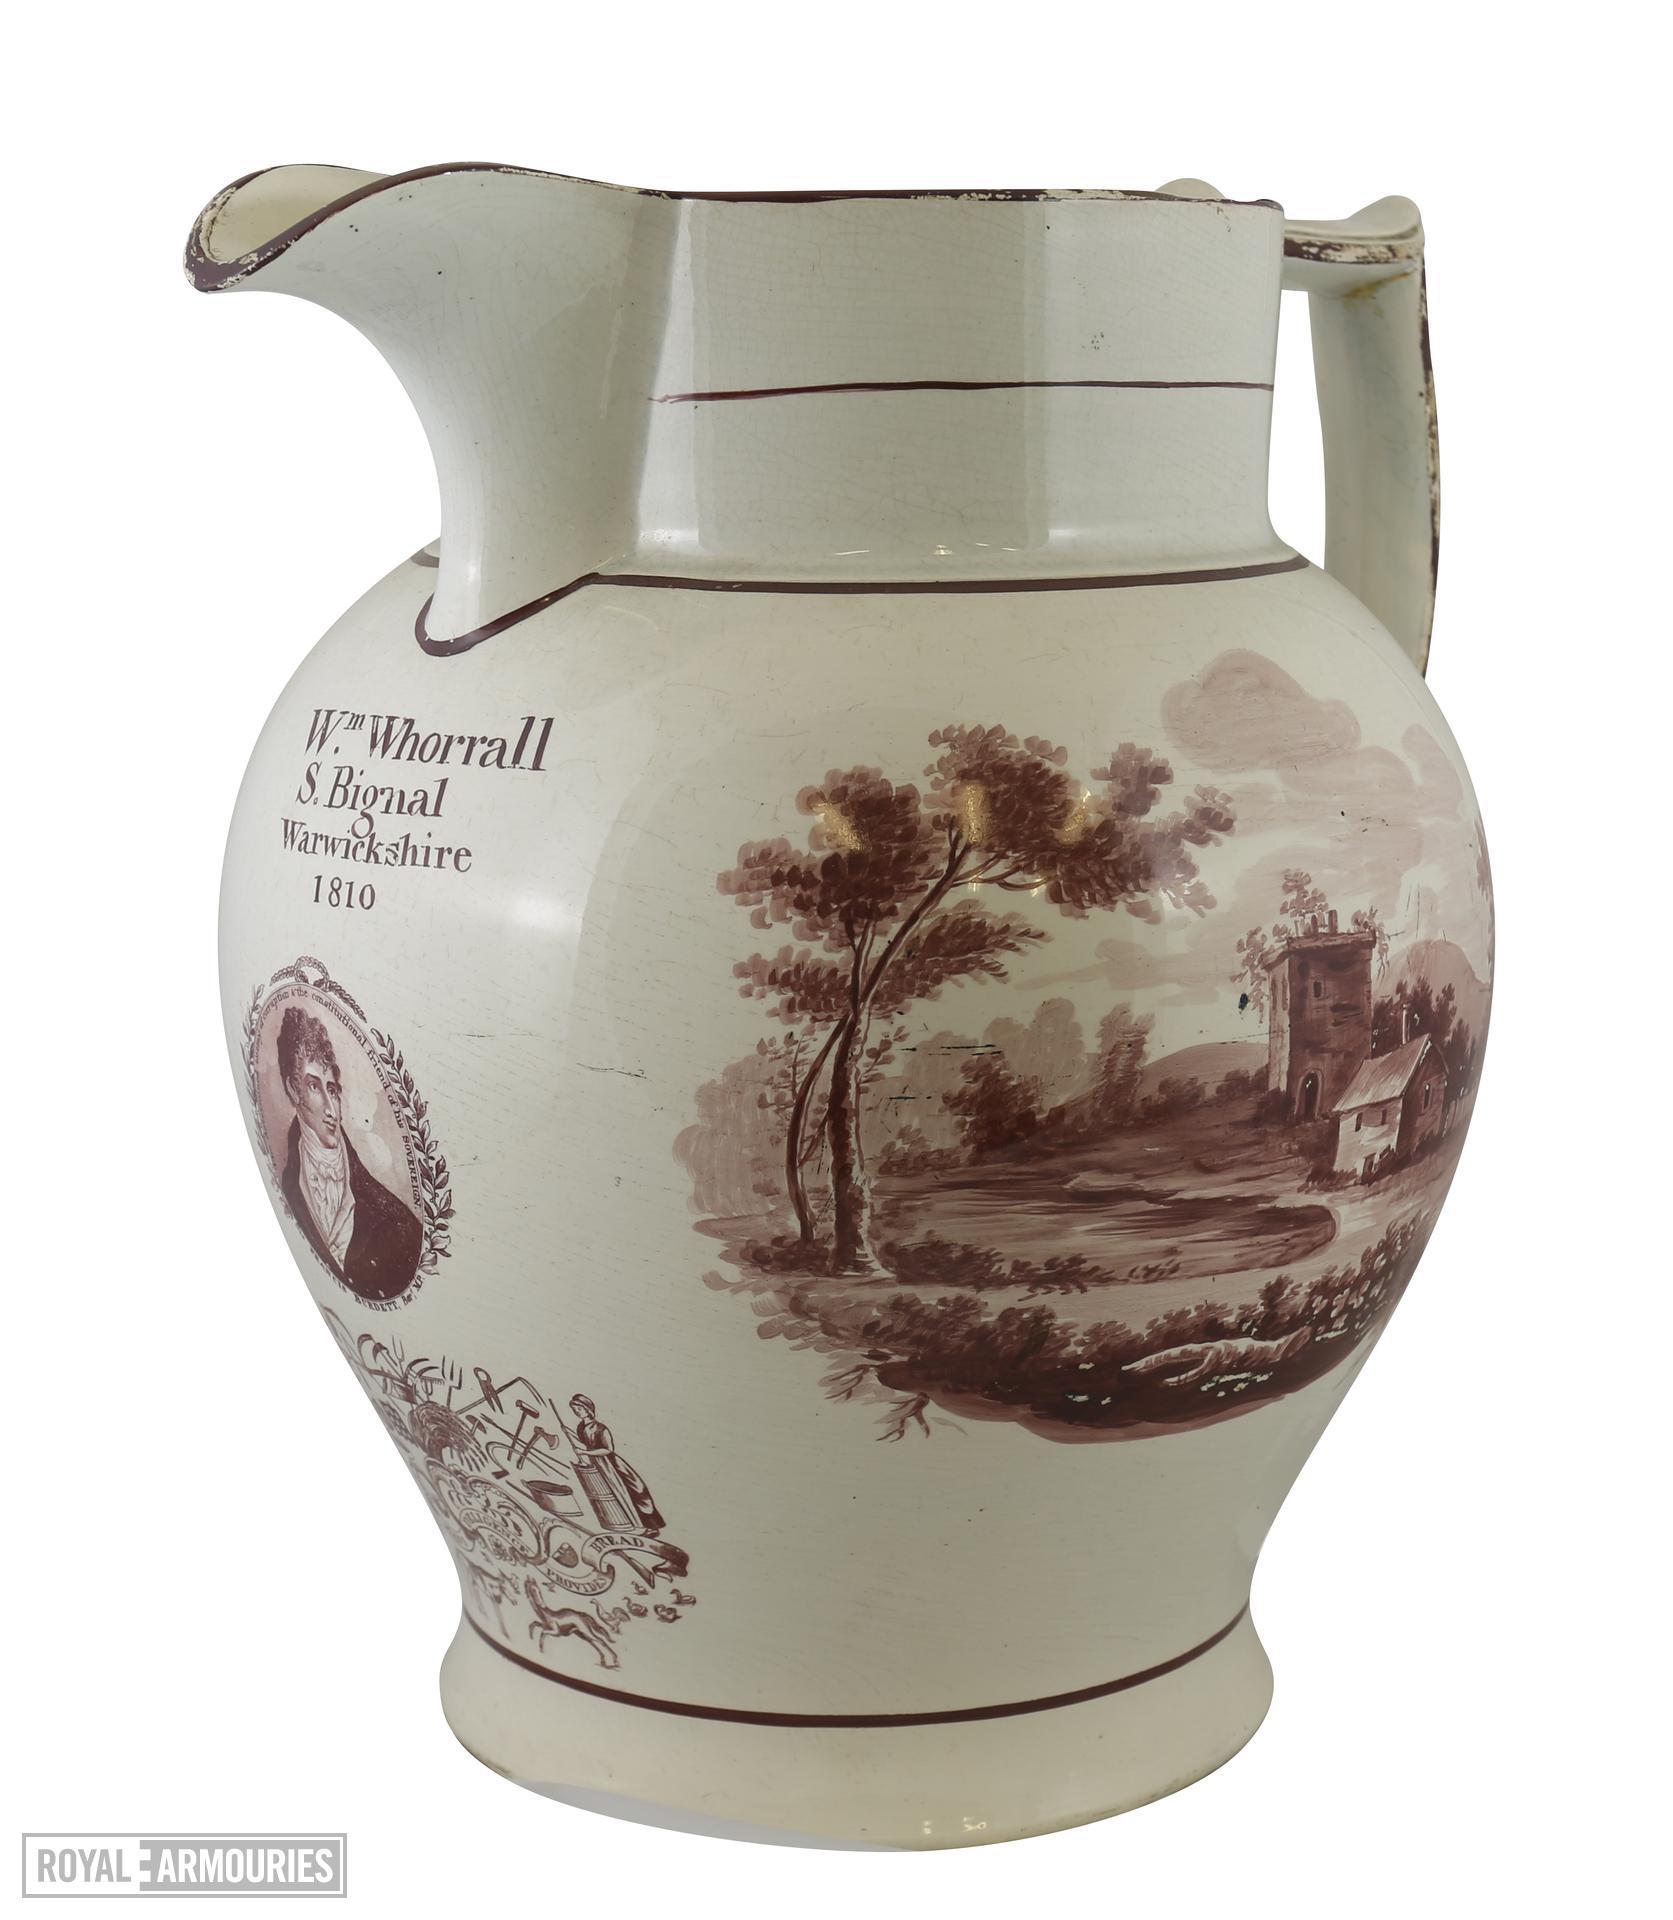 Staffordshire commemorative jug - Sir Francis Burdett